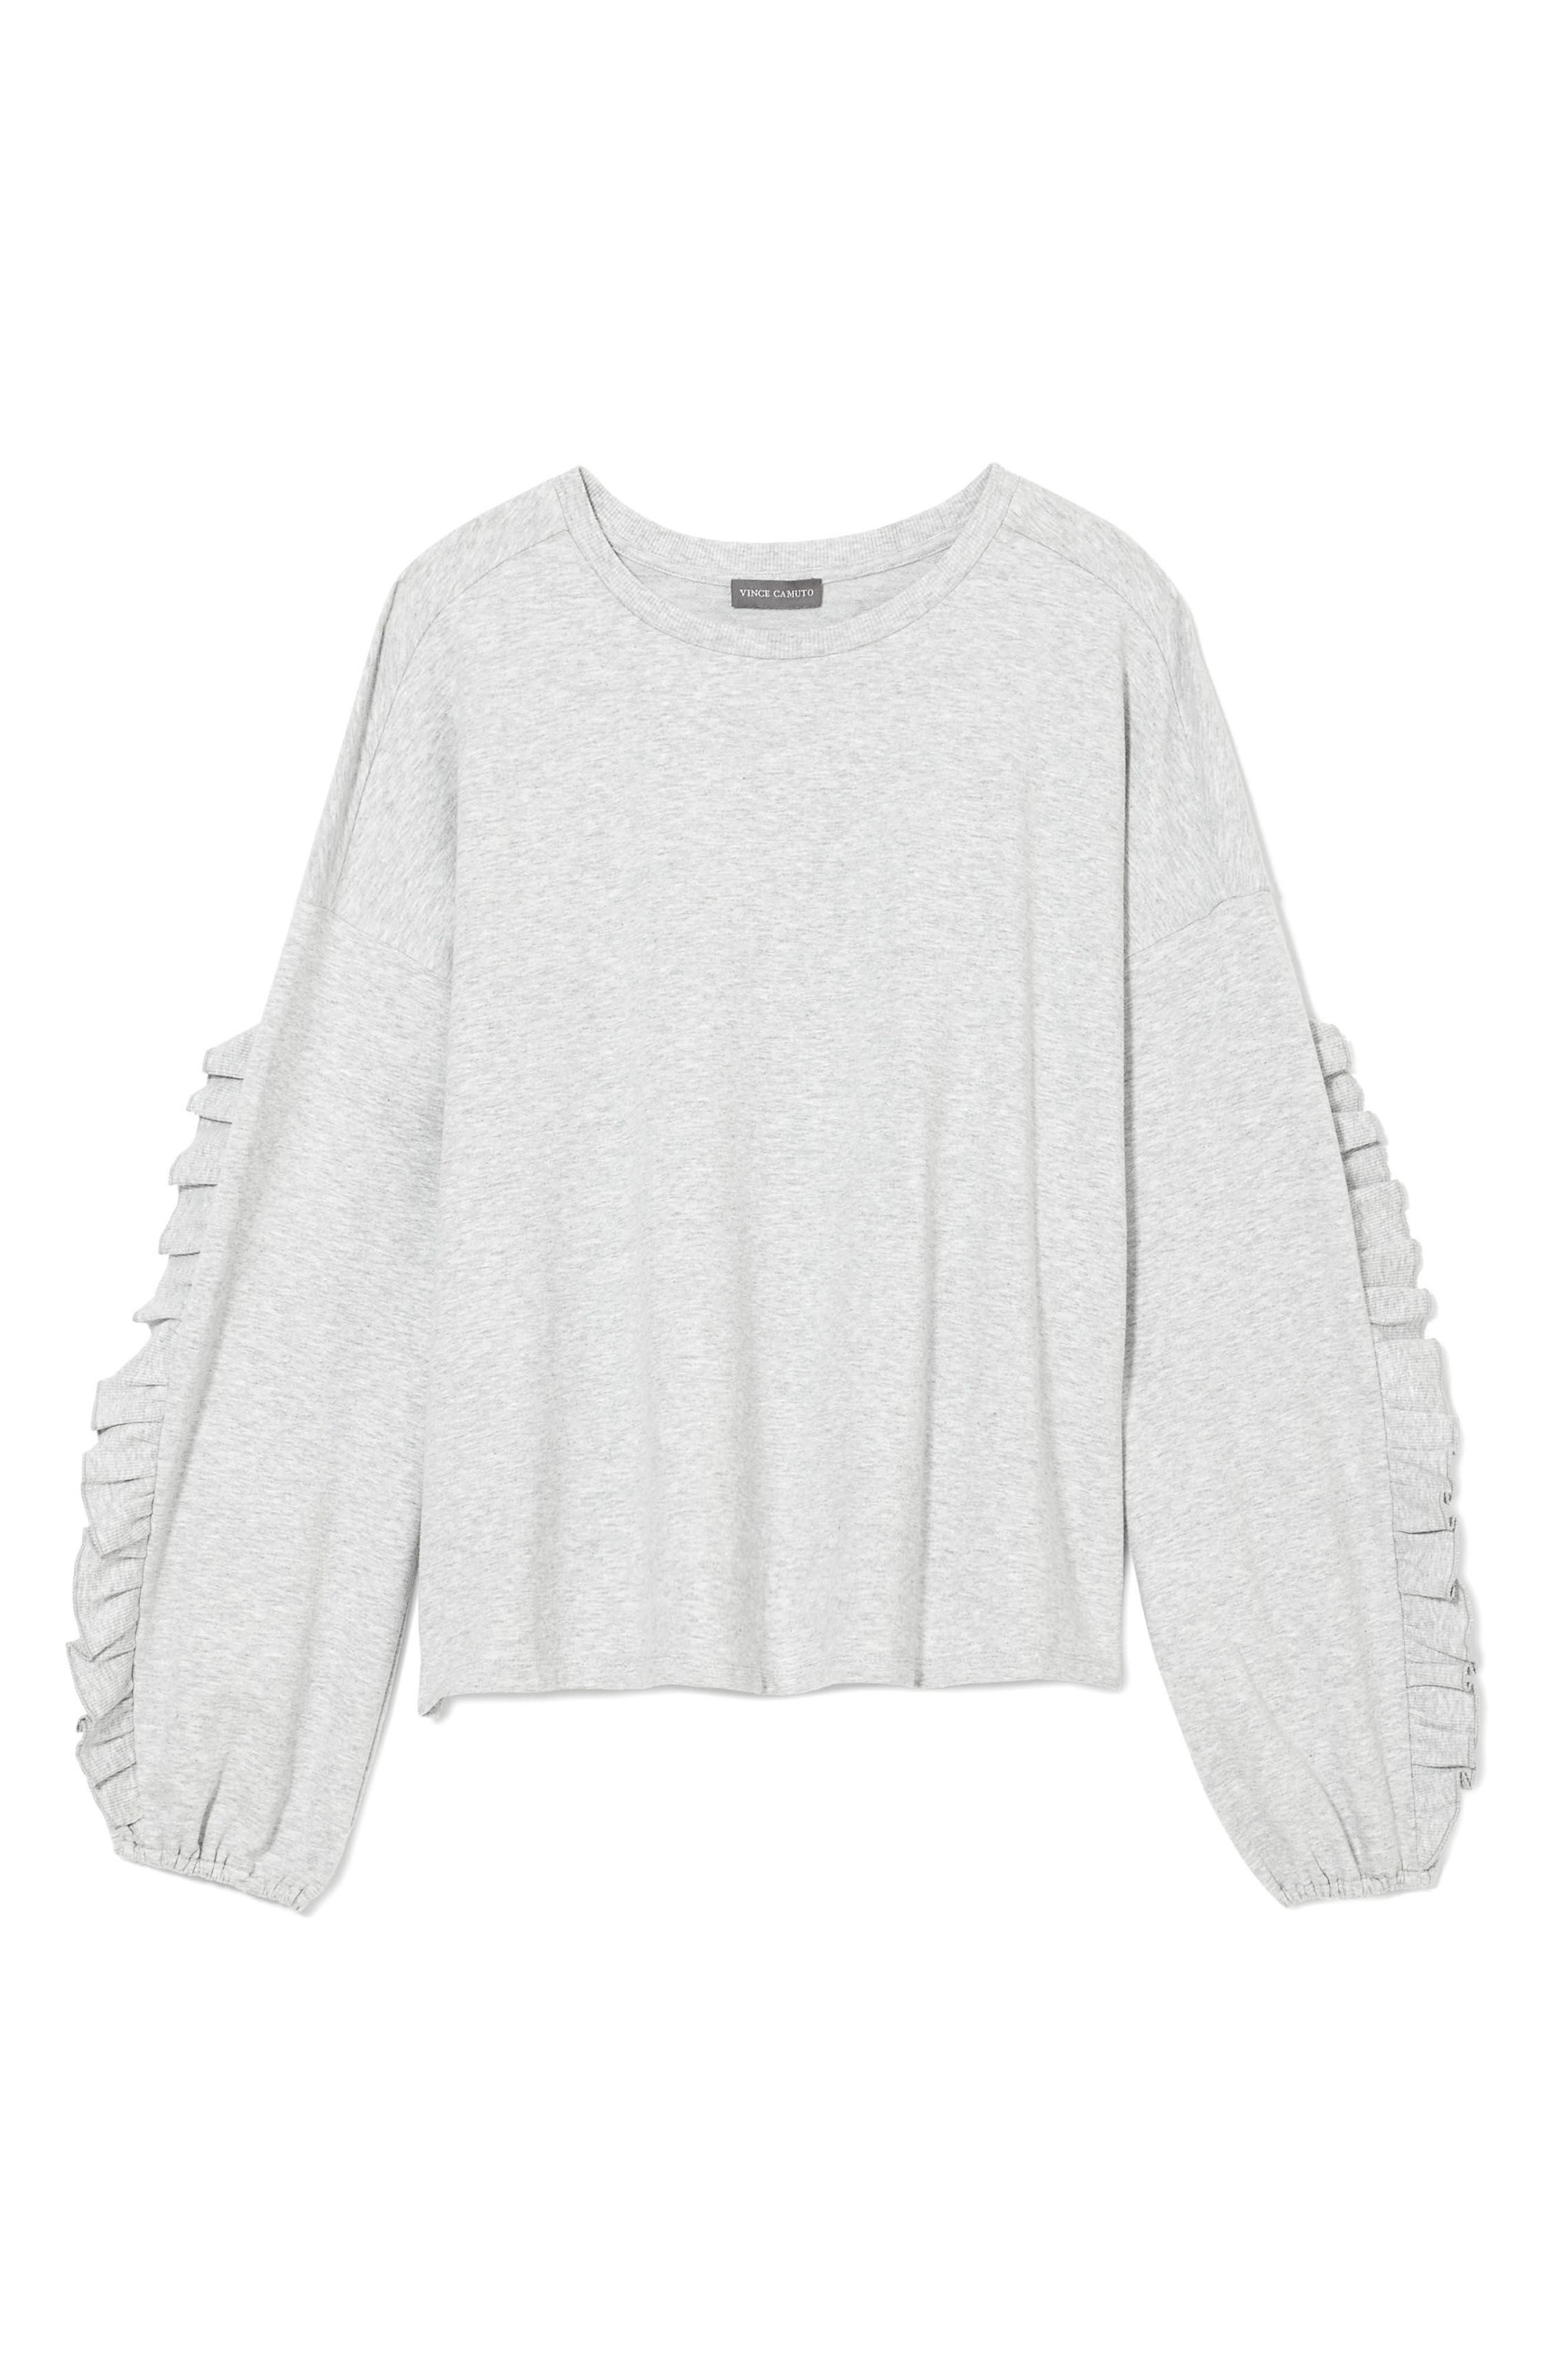 Ruffle Sleeve Sweatshirt,                             Alternate thumbnail 5, color,                             Grey Heather